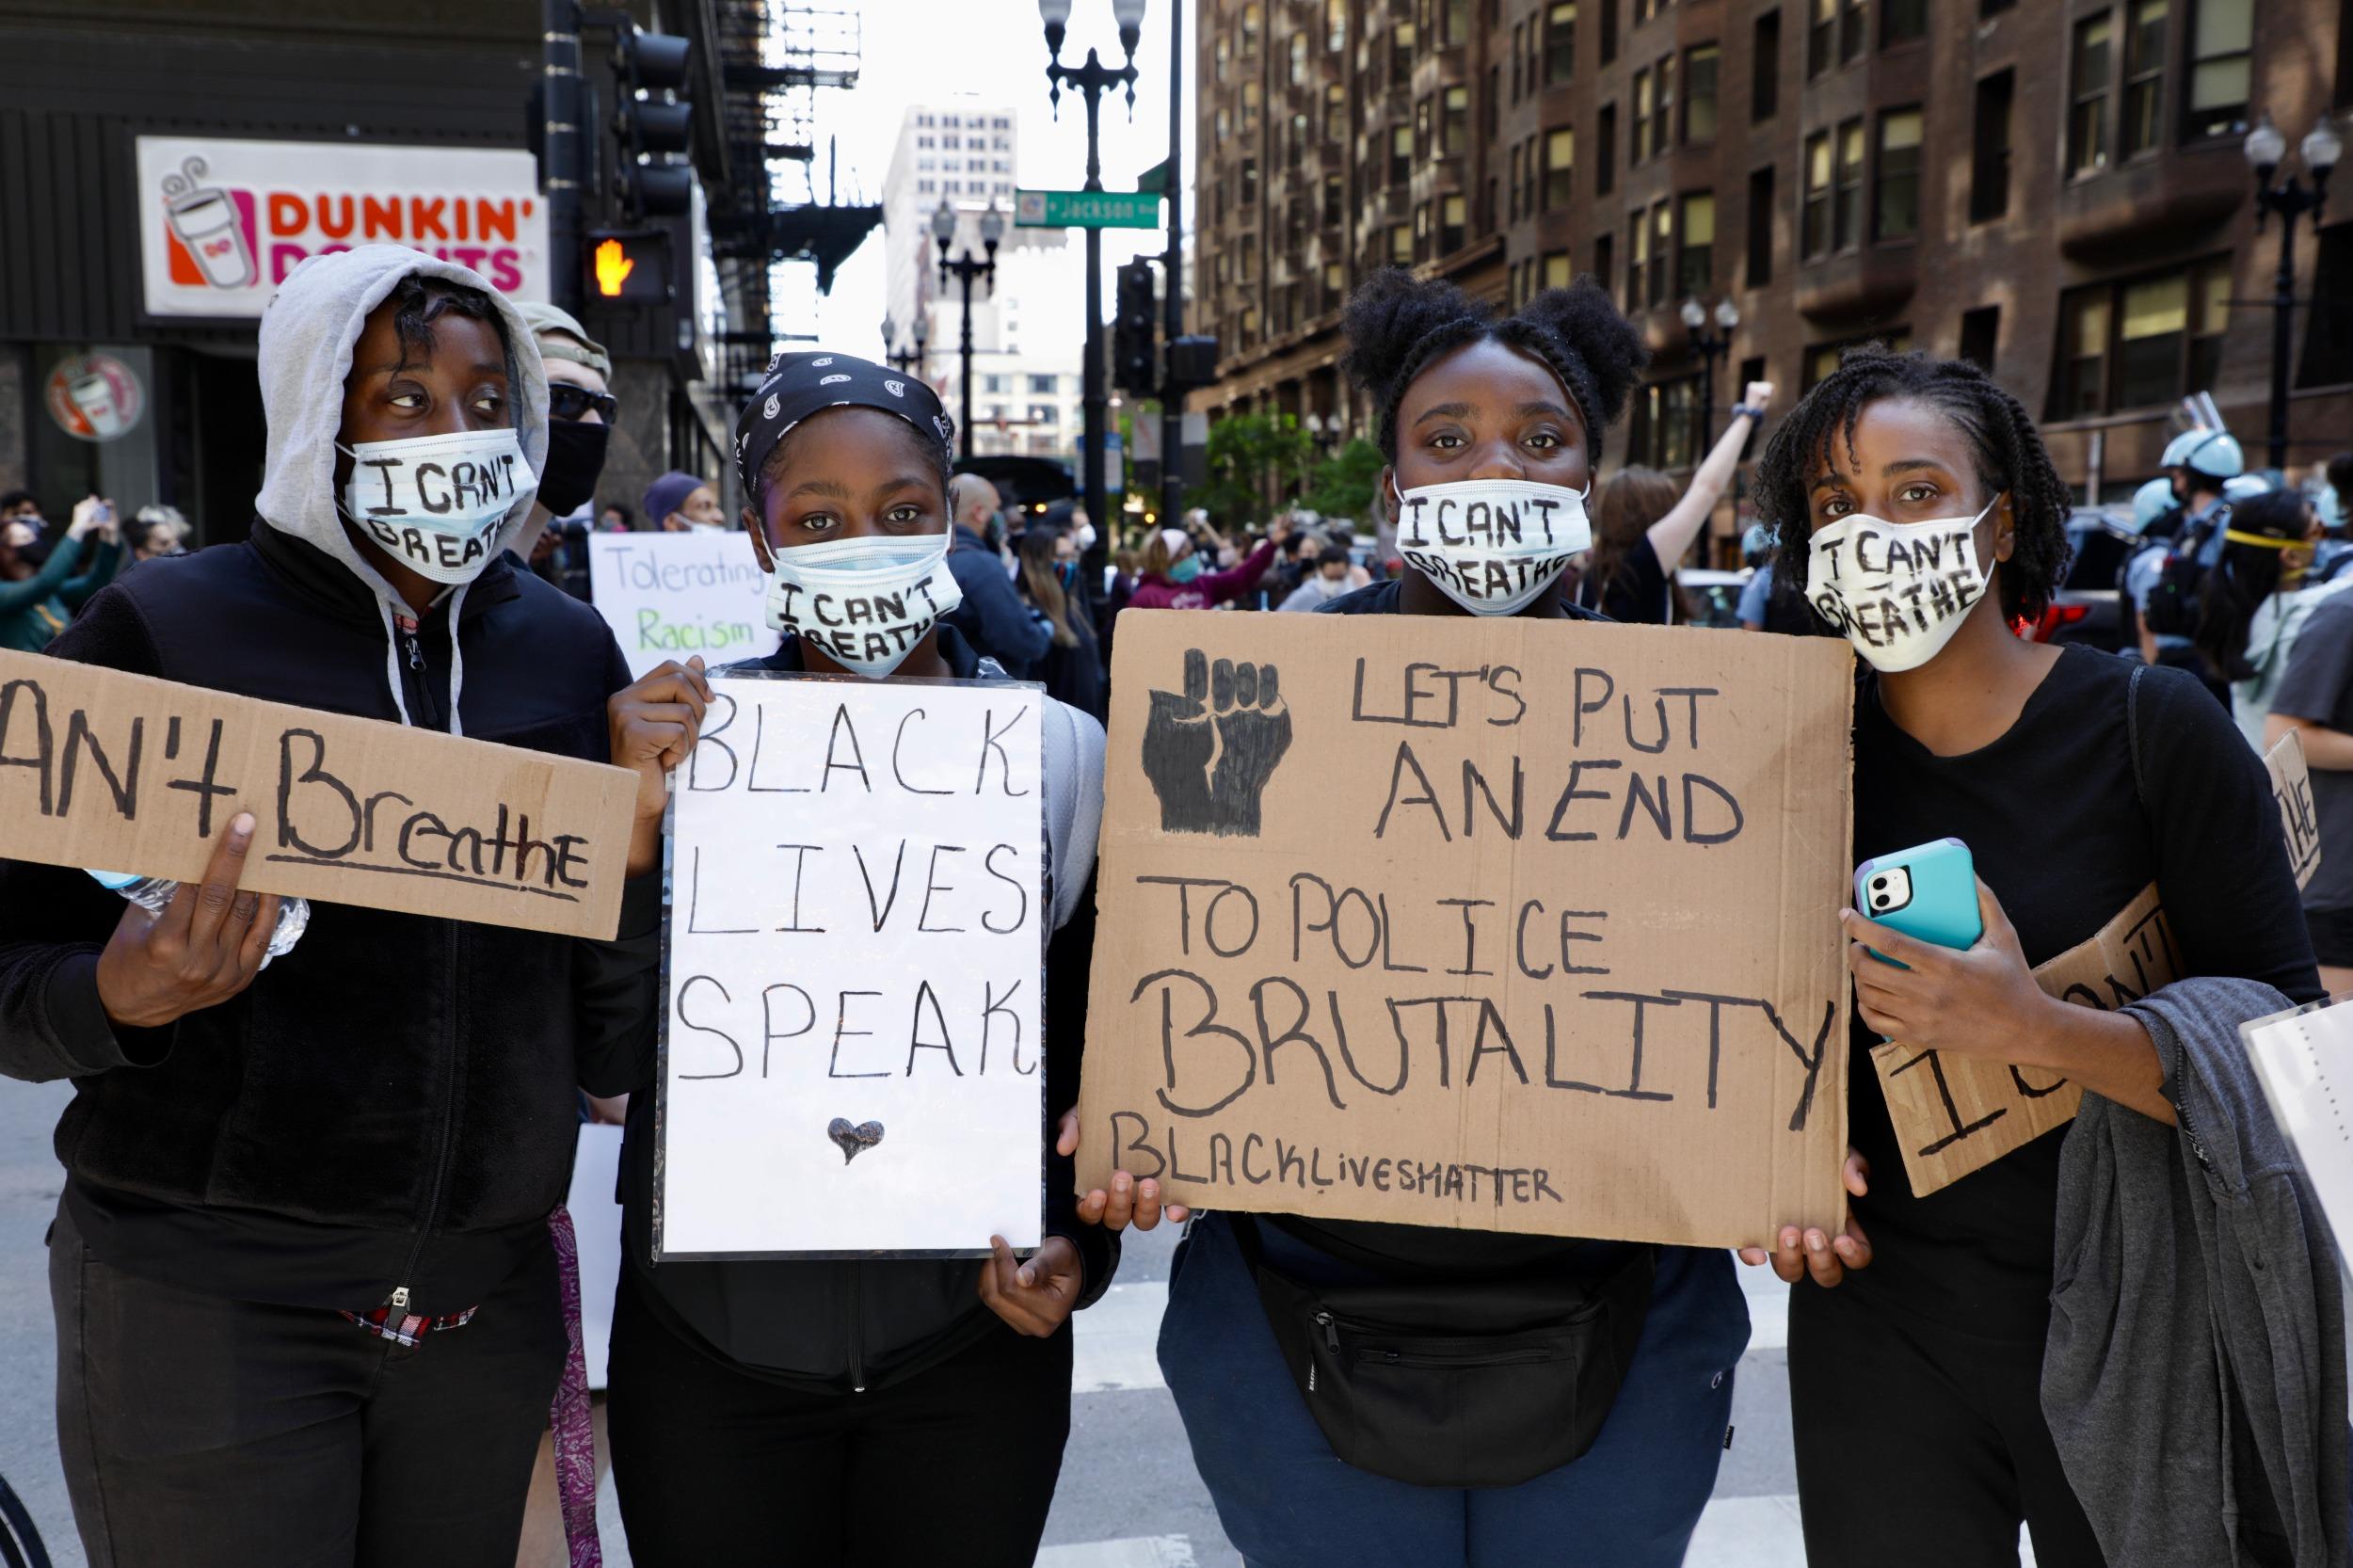 AfAm Floyd protestors